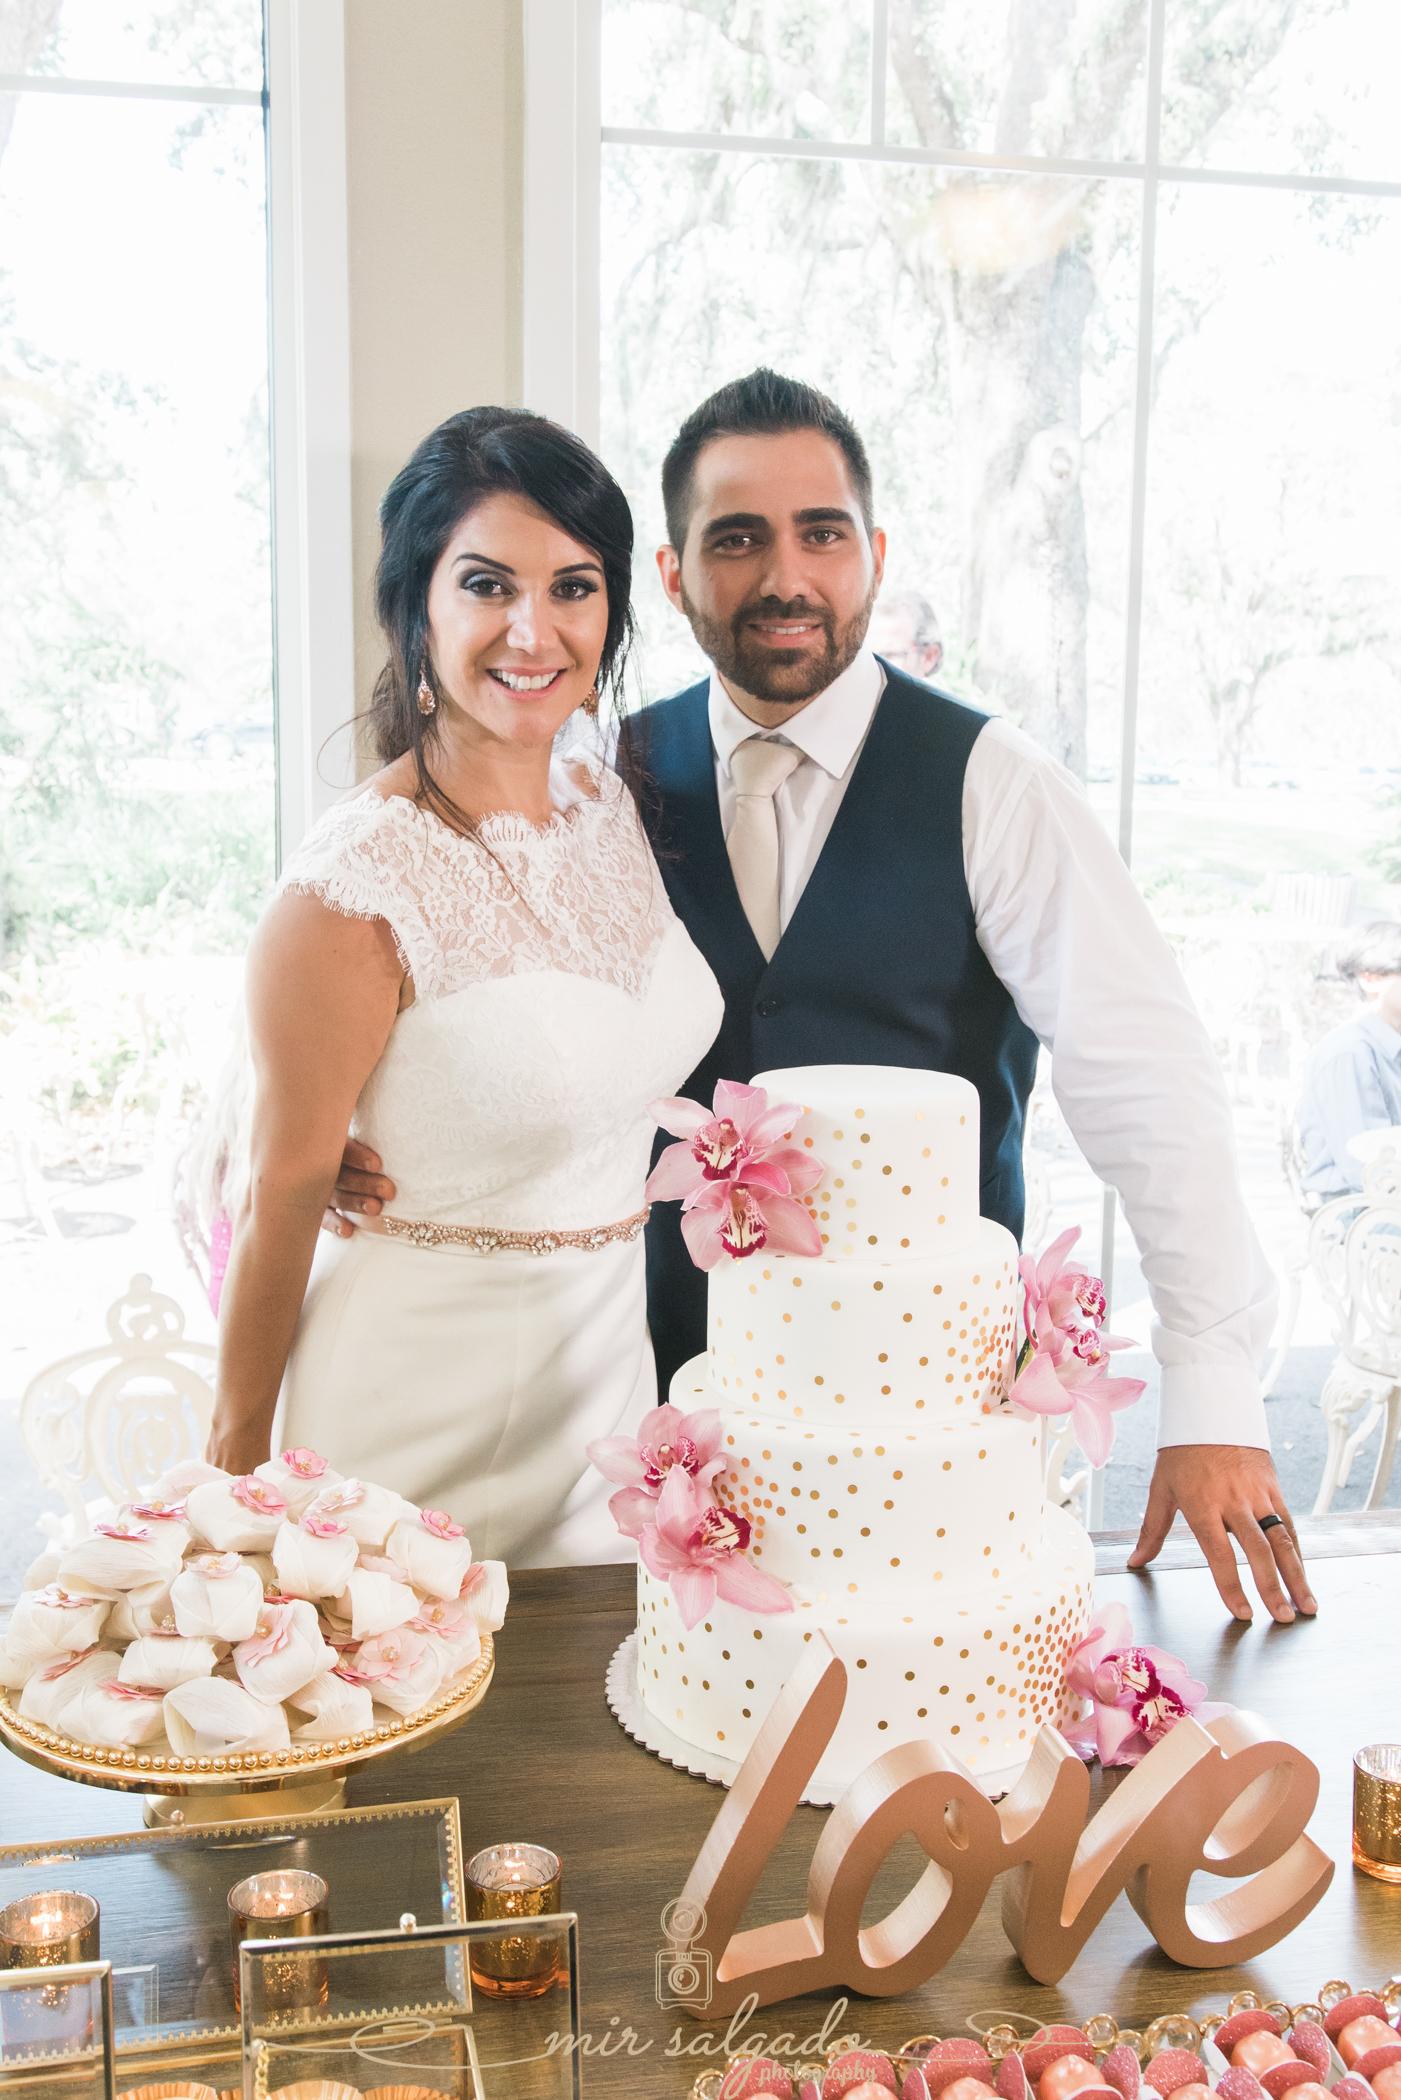 Bok-tower-gardens-wedding-photography, Cutting-cake-photo, Tampa-photographer